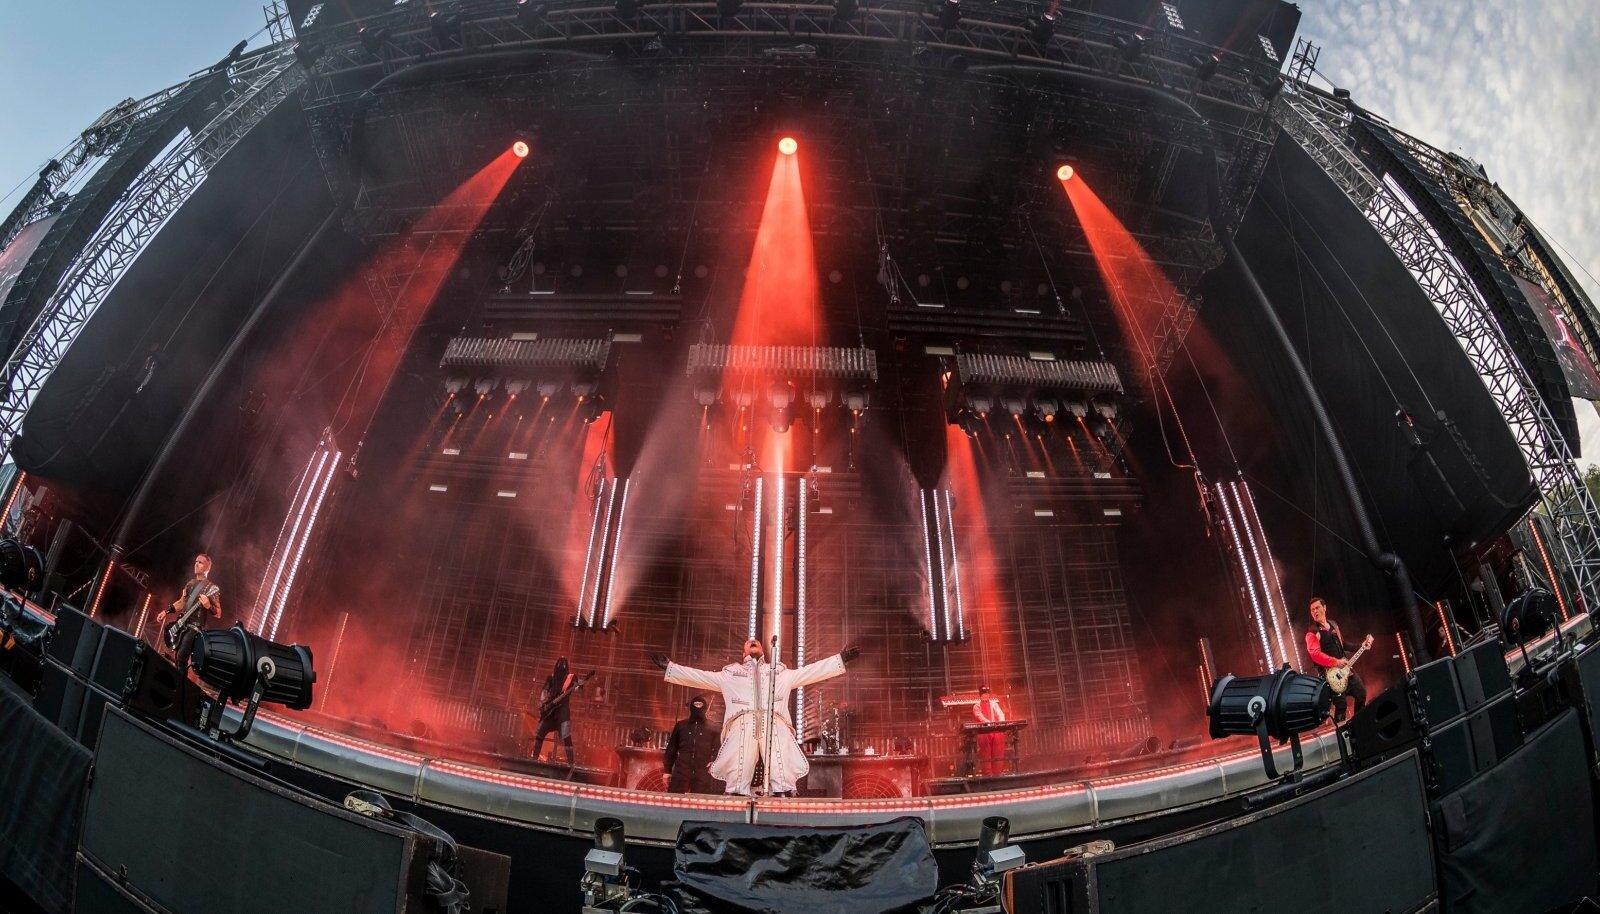 Rammsteini kontsert Tallinna lauluväljakul